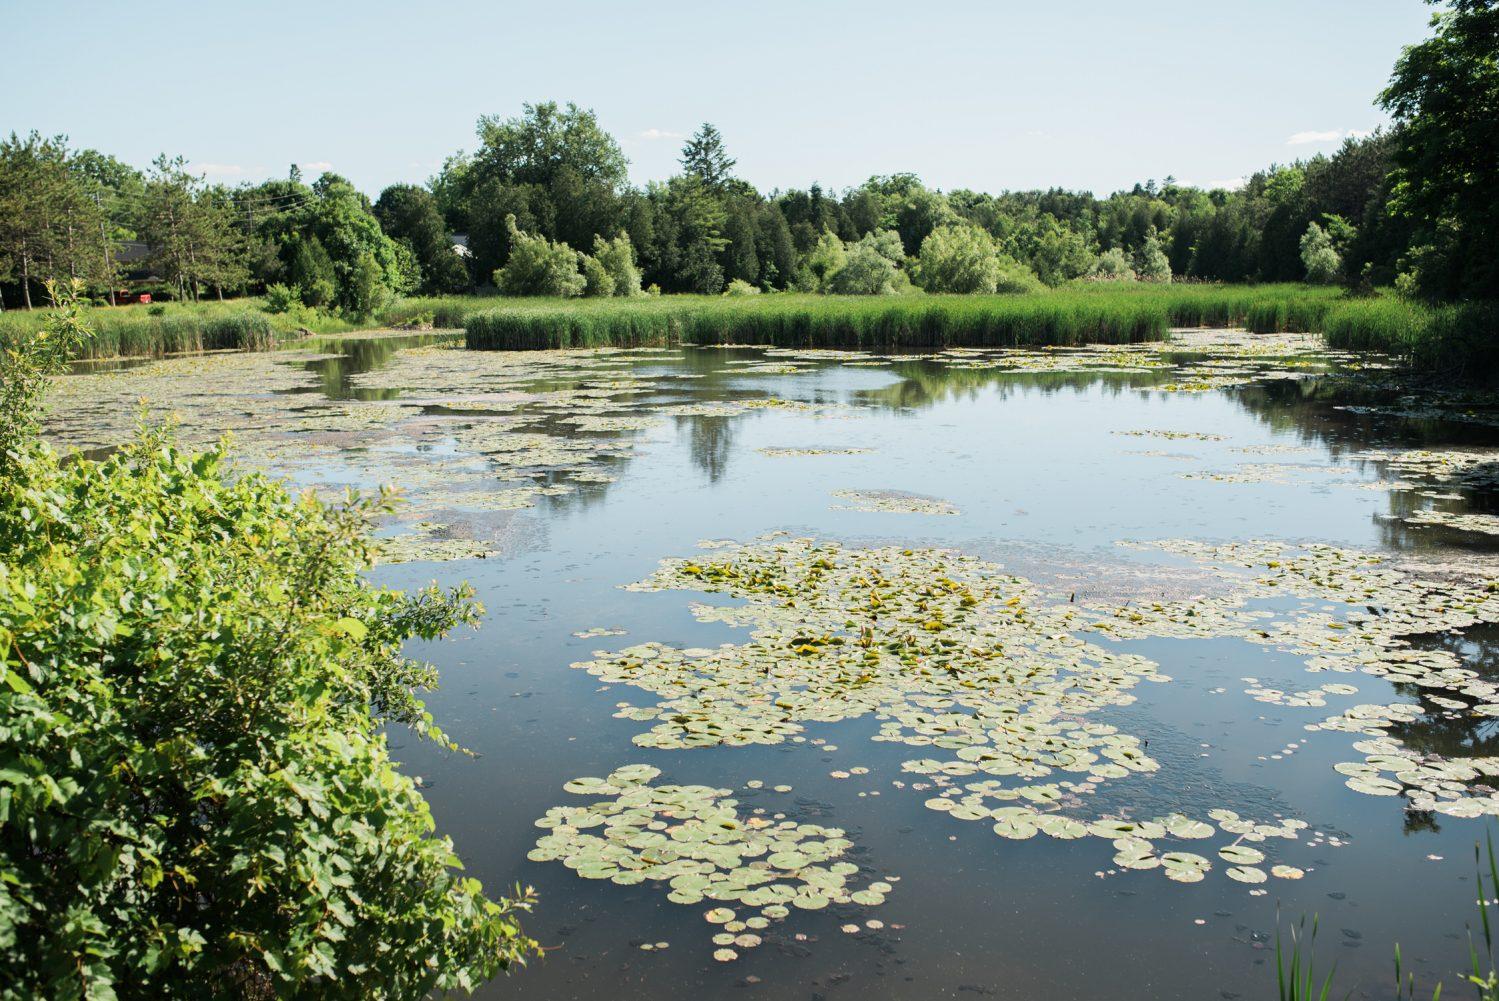 Alton Mill pond